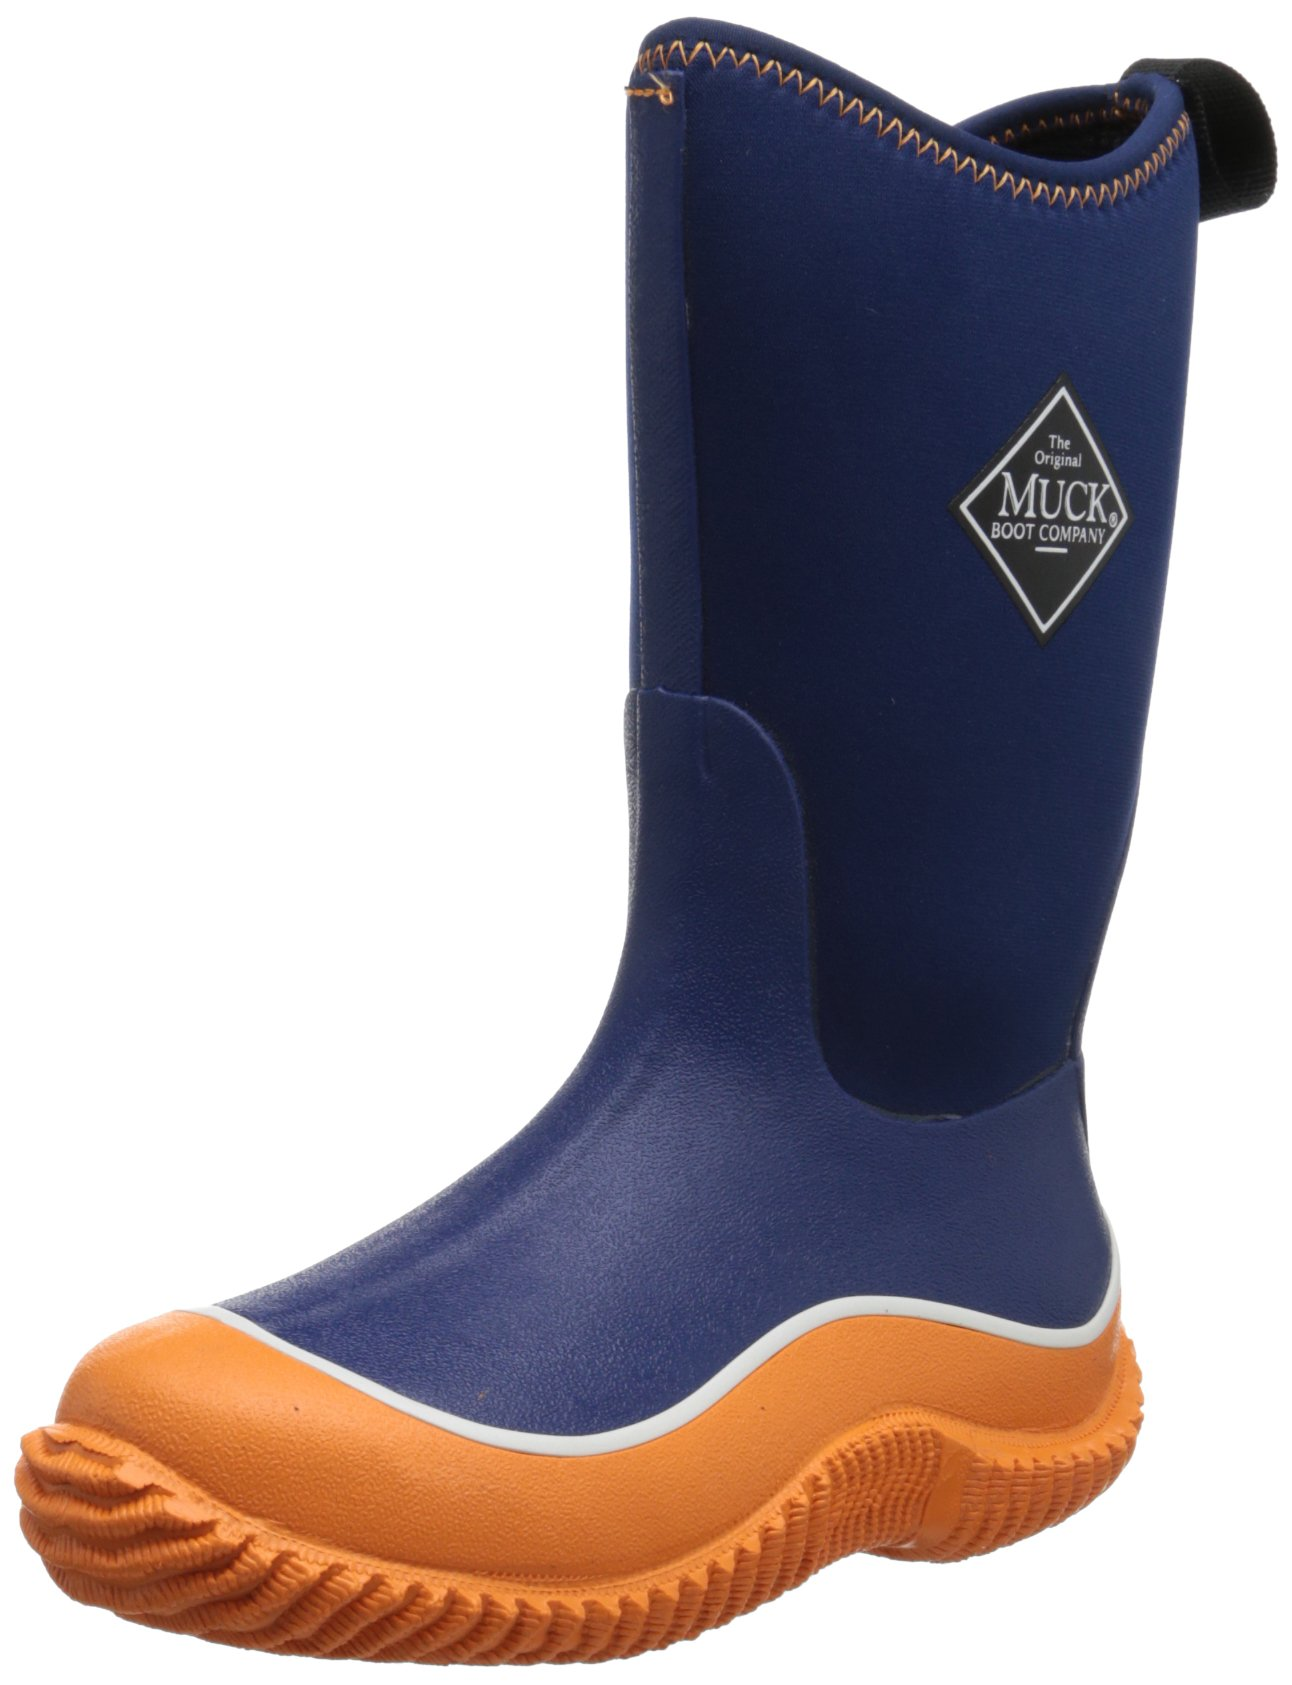 MuckBoots Hale Boot,Orange/Navy,11 M US Little Kid